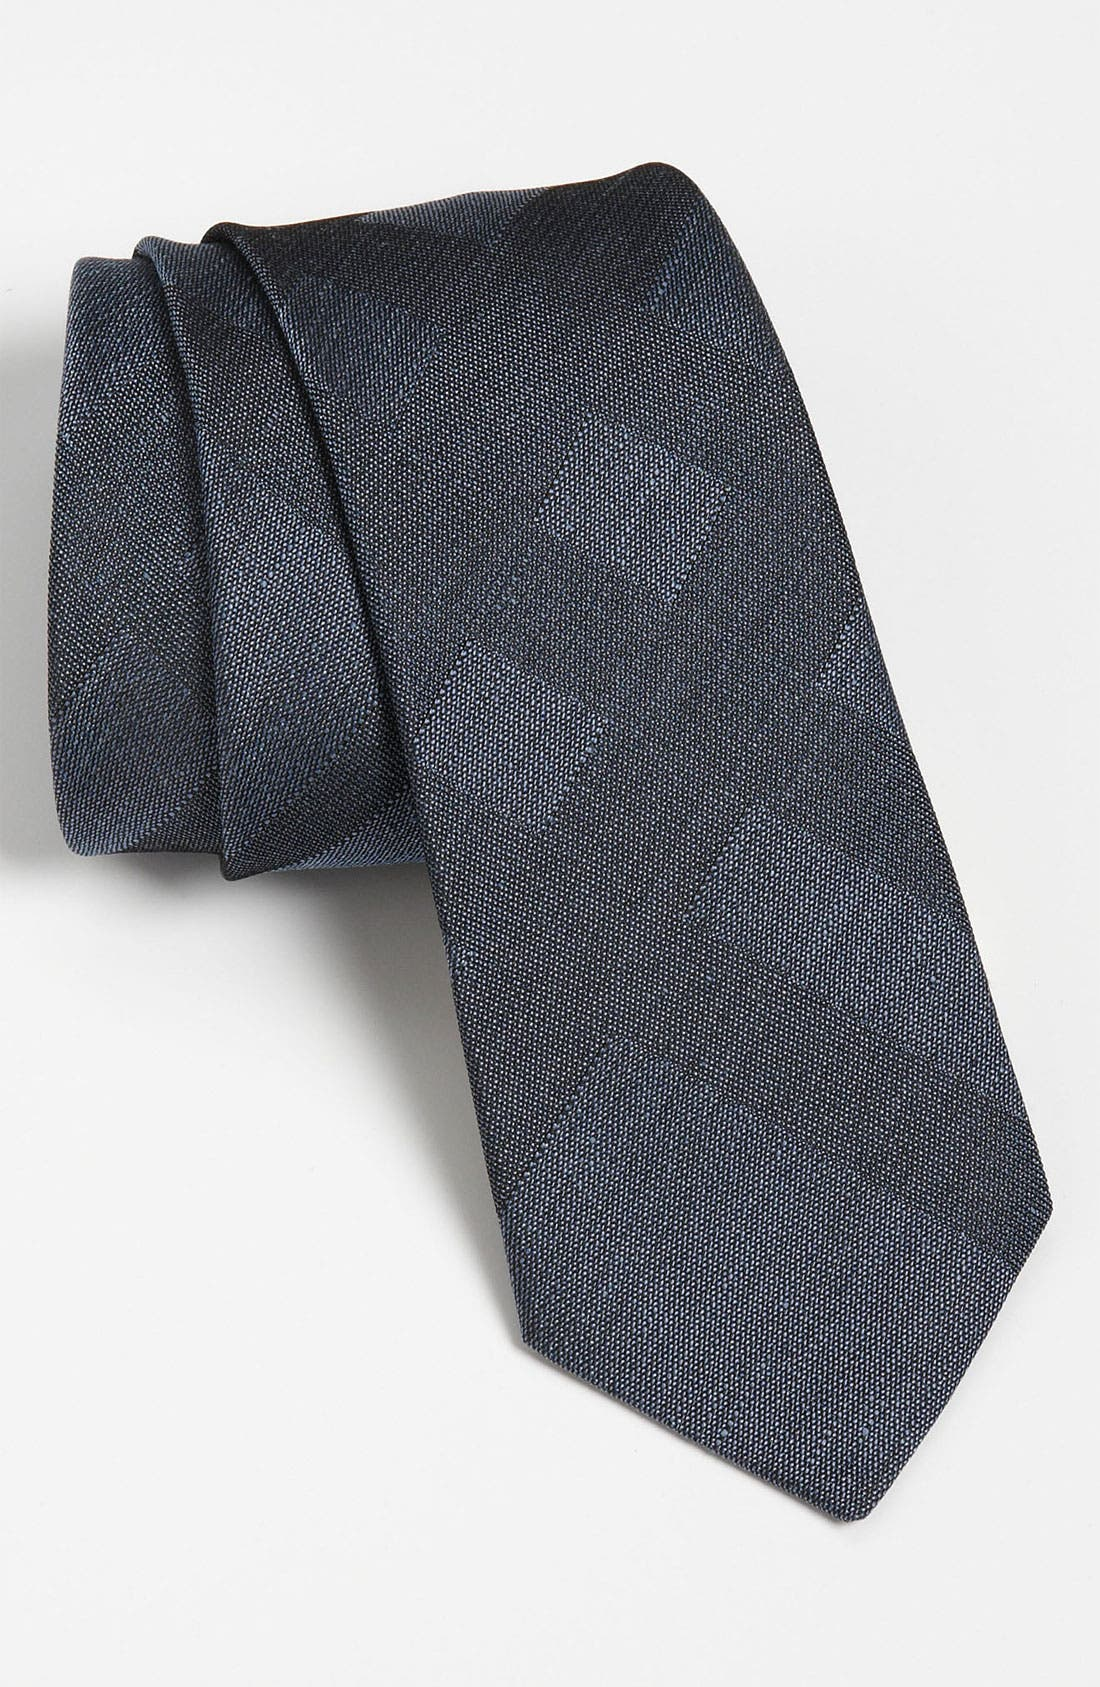 Alternate Image 1 Selected - Burberry London Woven Silk & Linen Tie